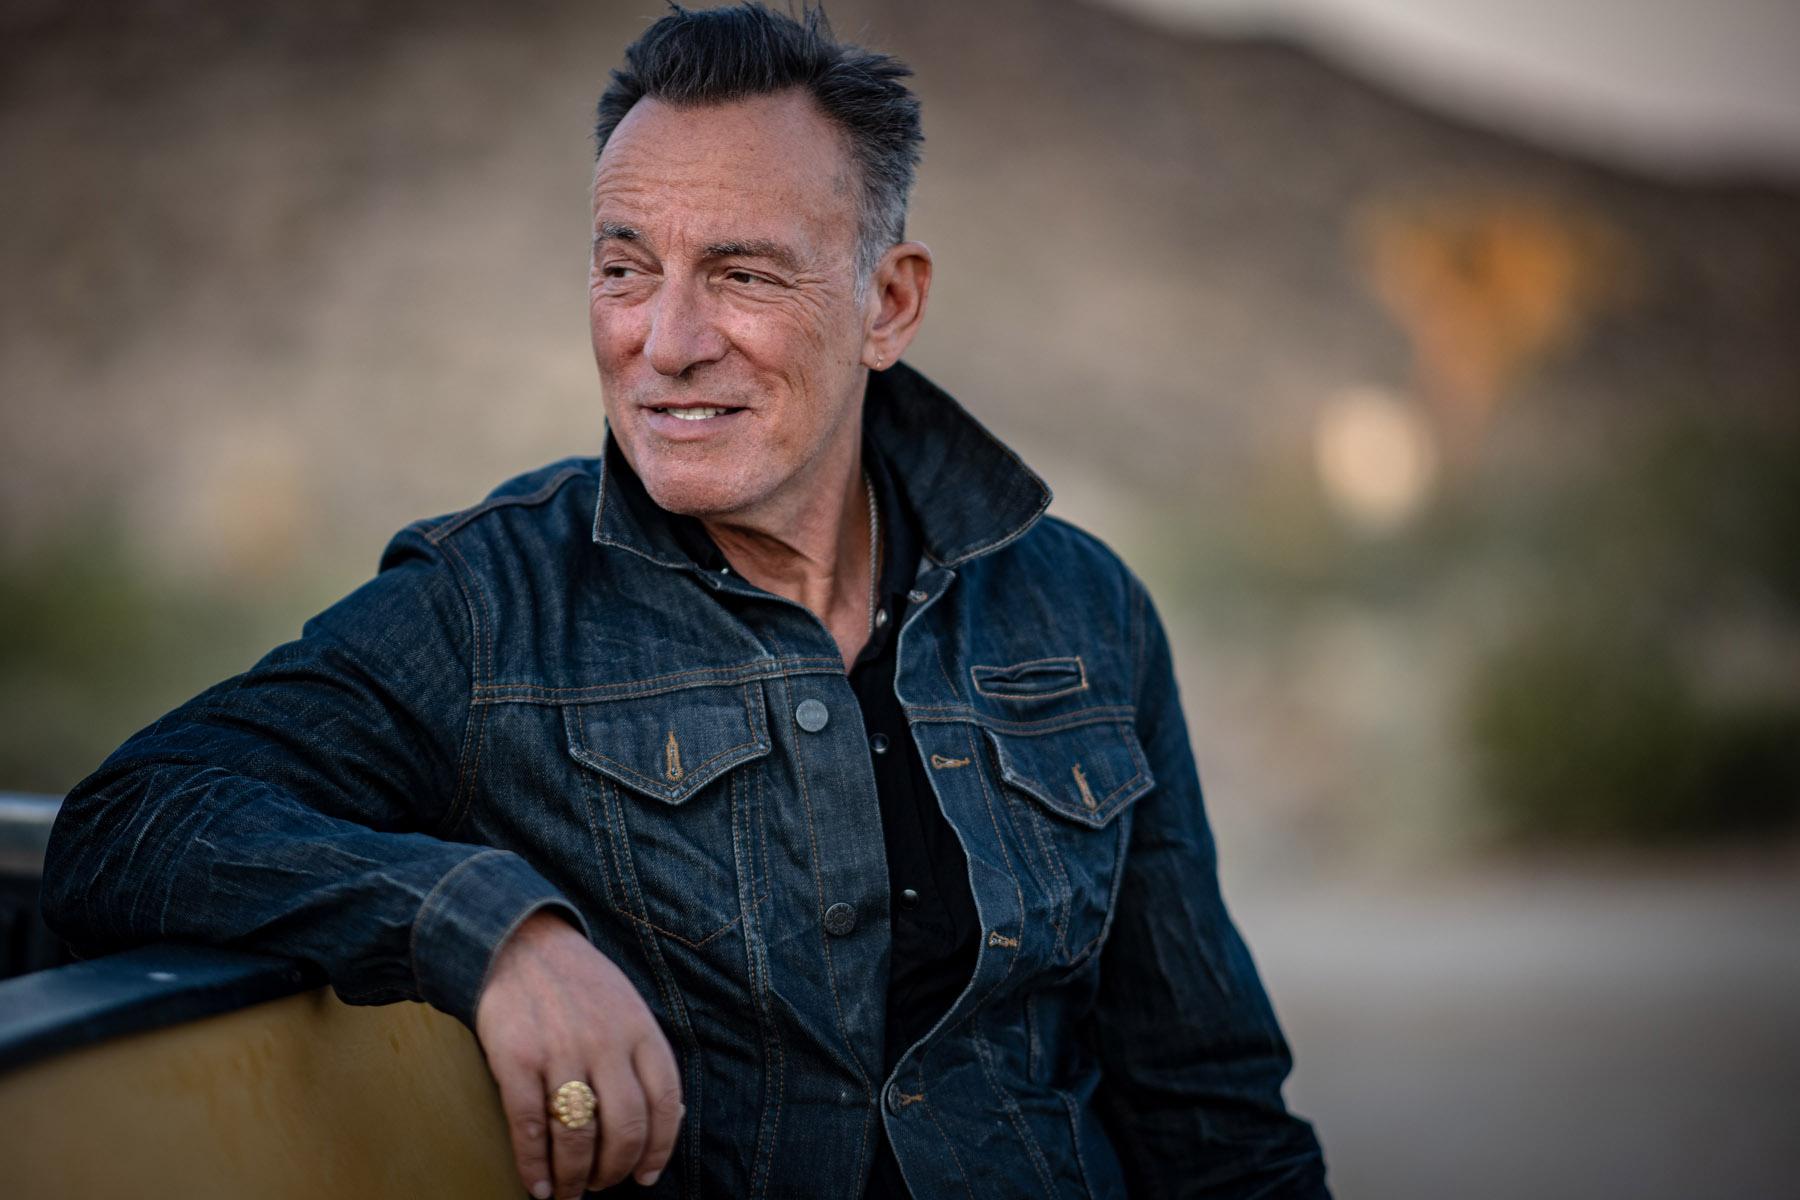 Bruce Springsteen Prays for Grief-Stricken U.S., Blasts Donald Trump -  Rolling Stone